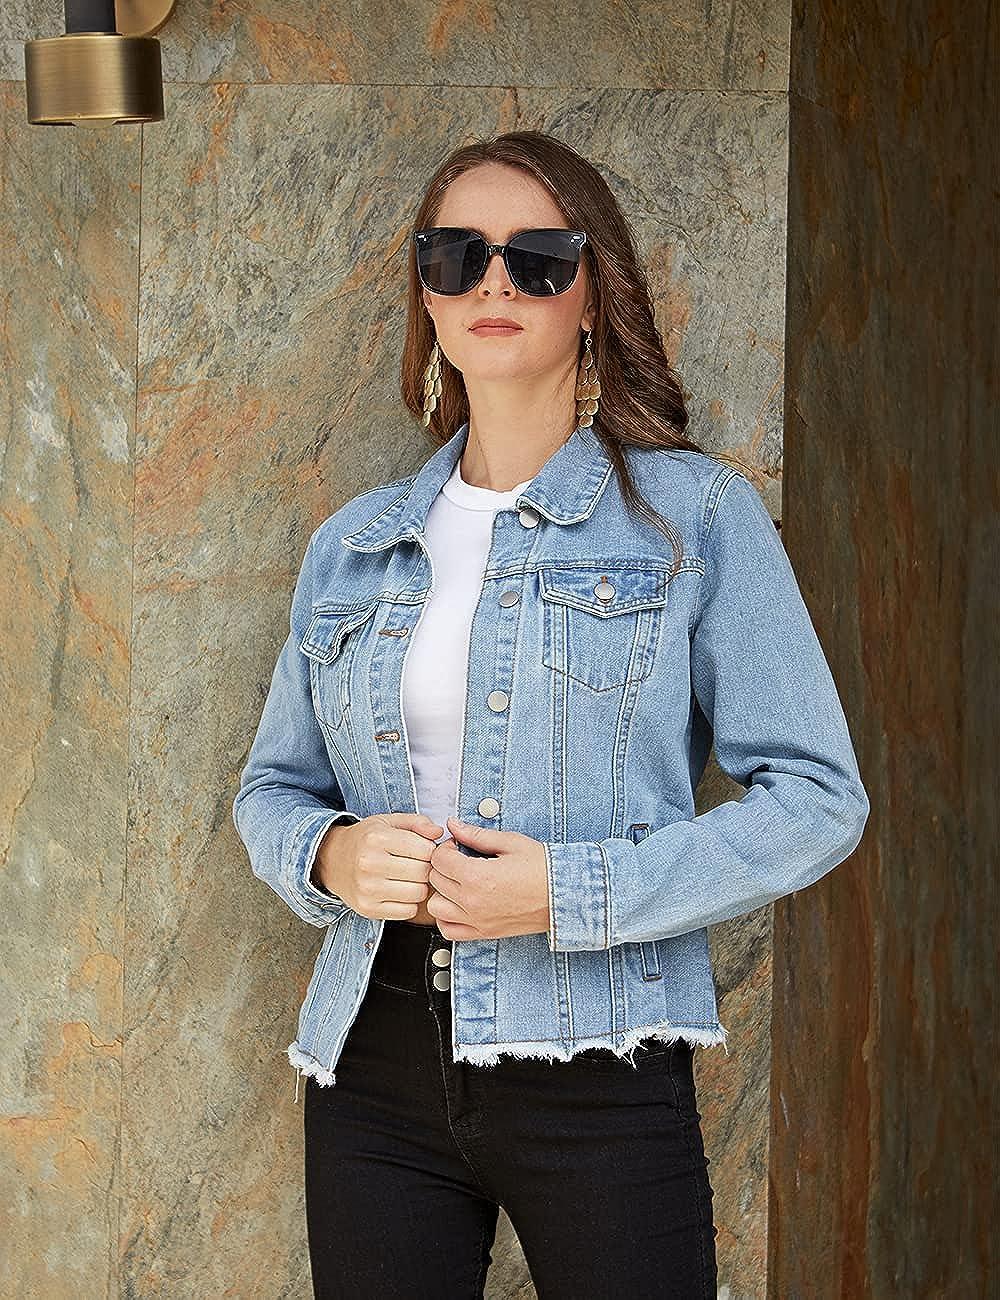 Dilgul Women's Denim Jacket Casual Long Sleeve Frayed Washed Button Up Jean Jacket